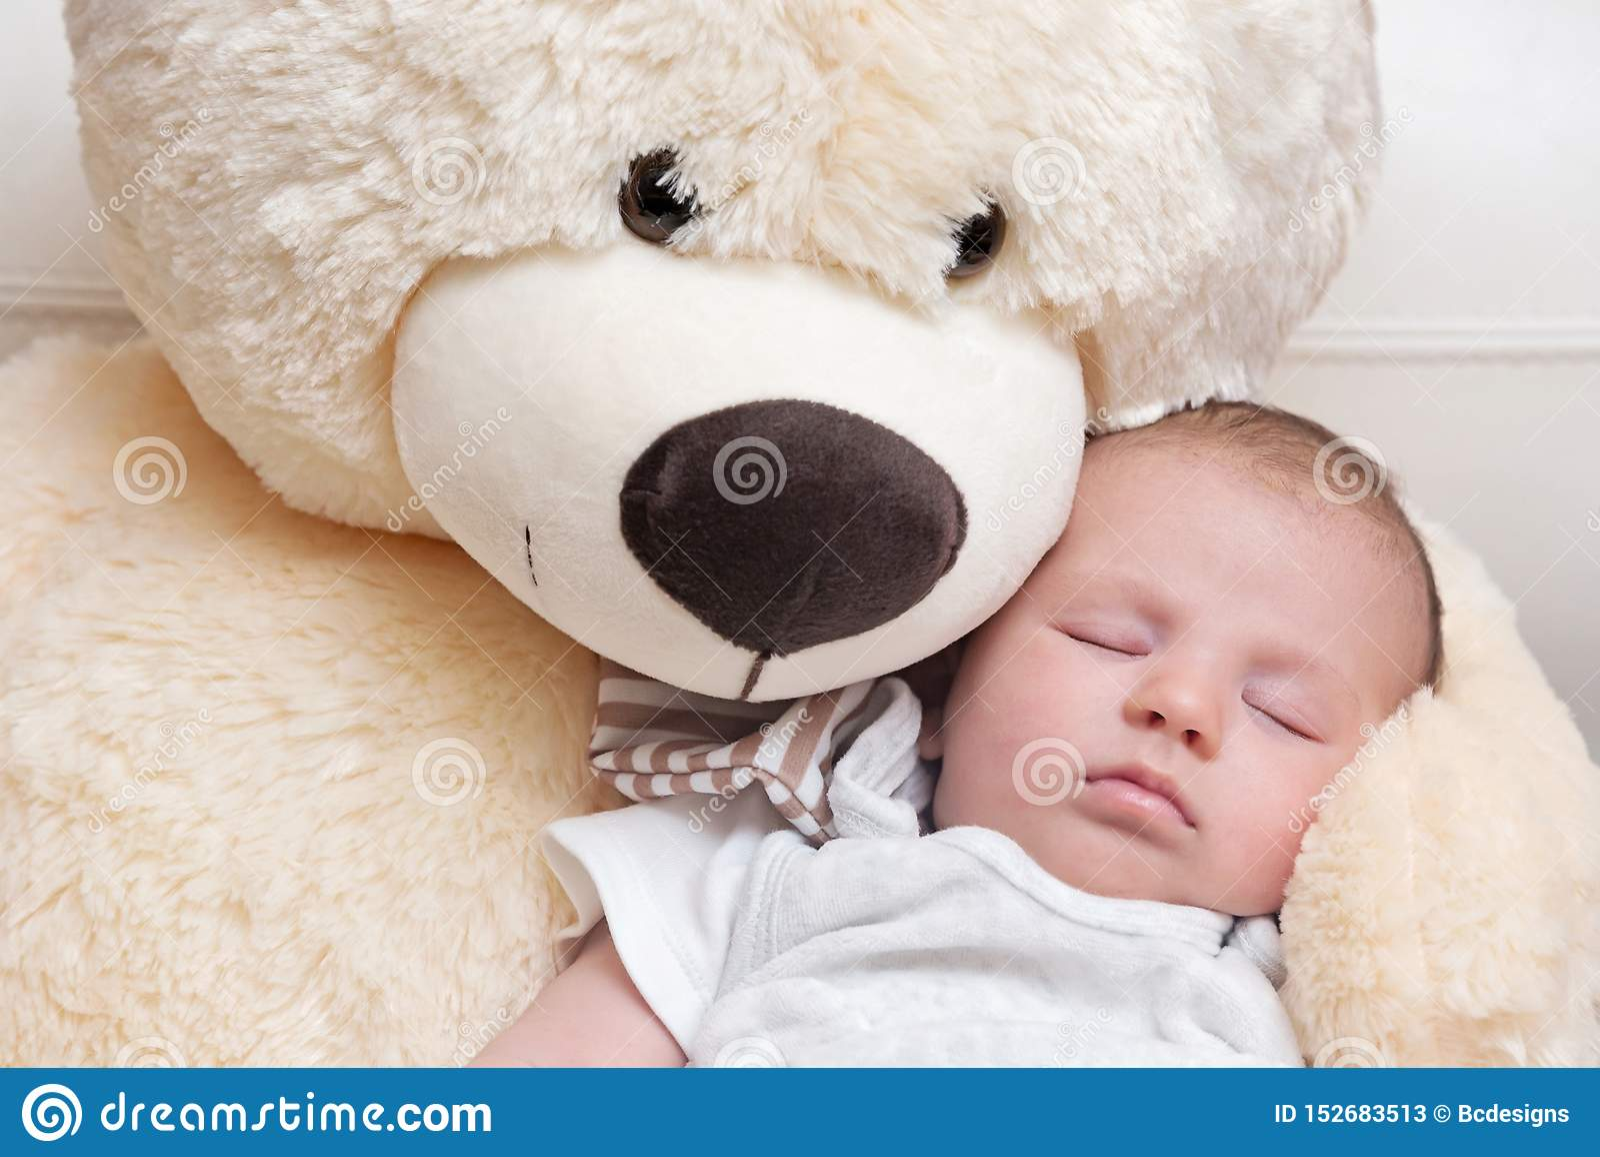 Hay Hay Chicken Stuffed Animal, Baby Boy Sleeping With Big Teddy Bear Stock Image Image Of Home Child 152683513